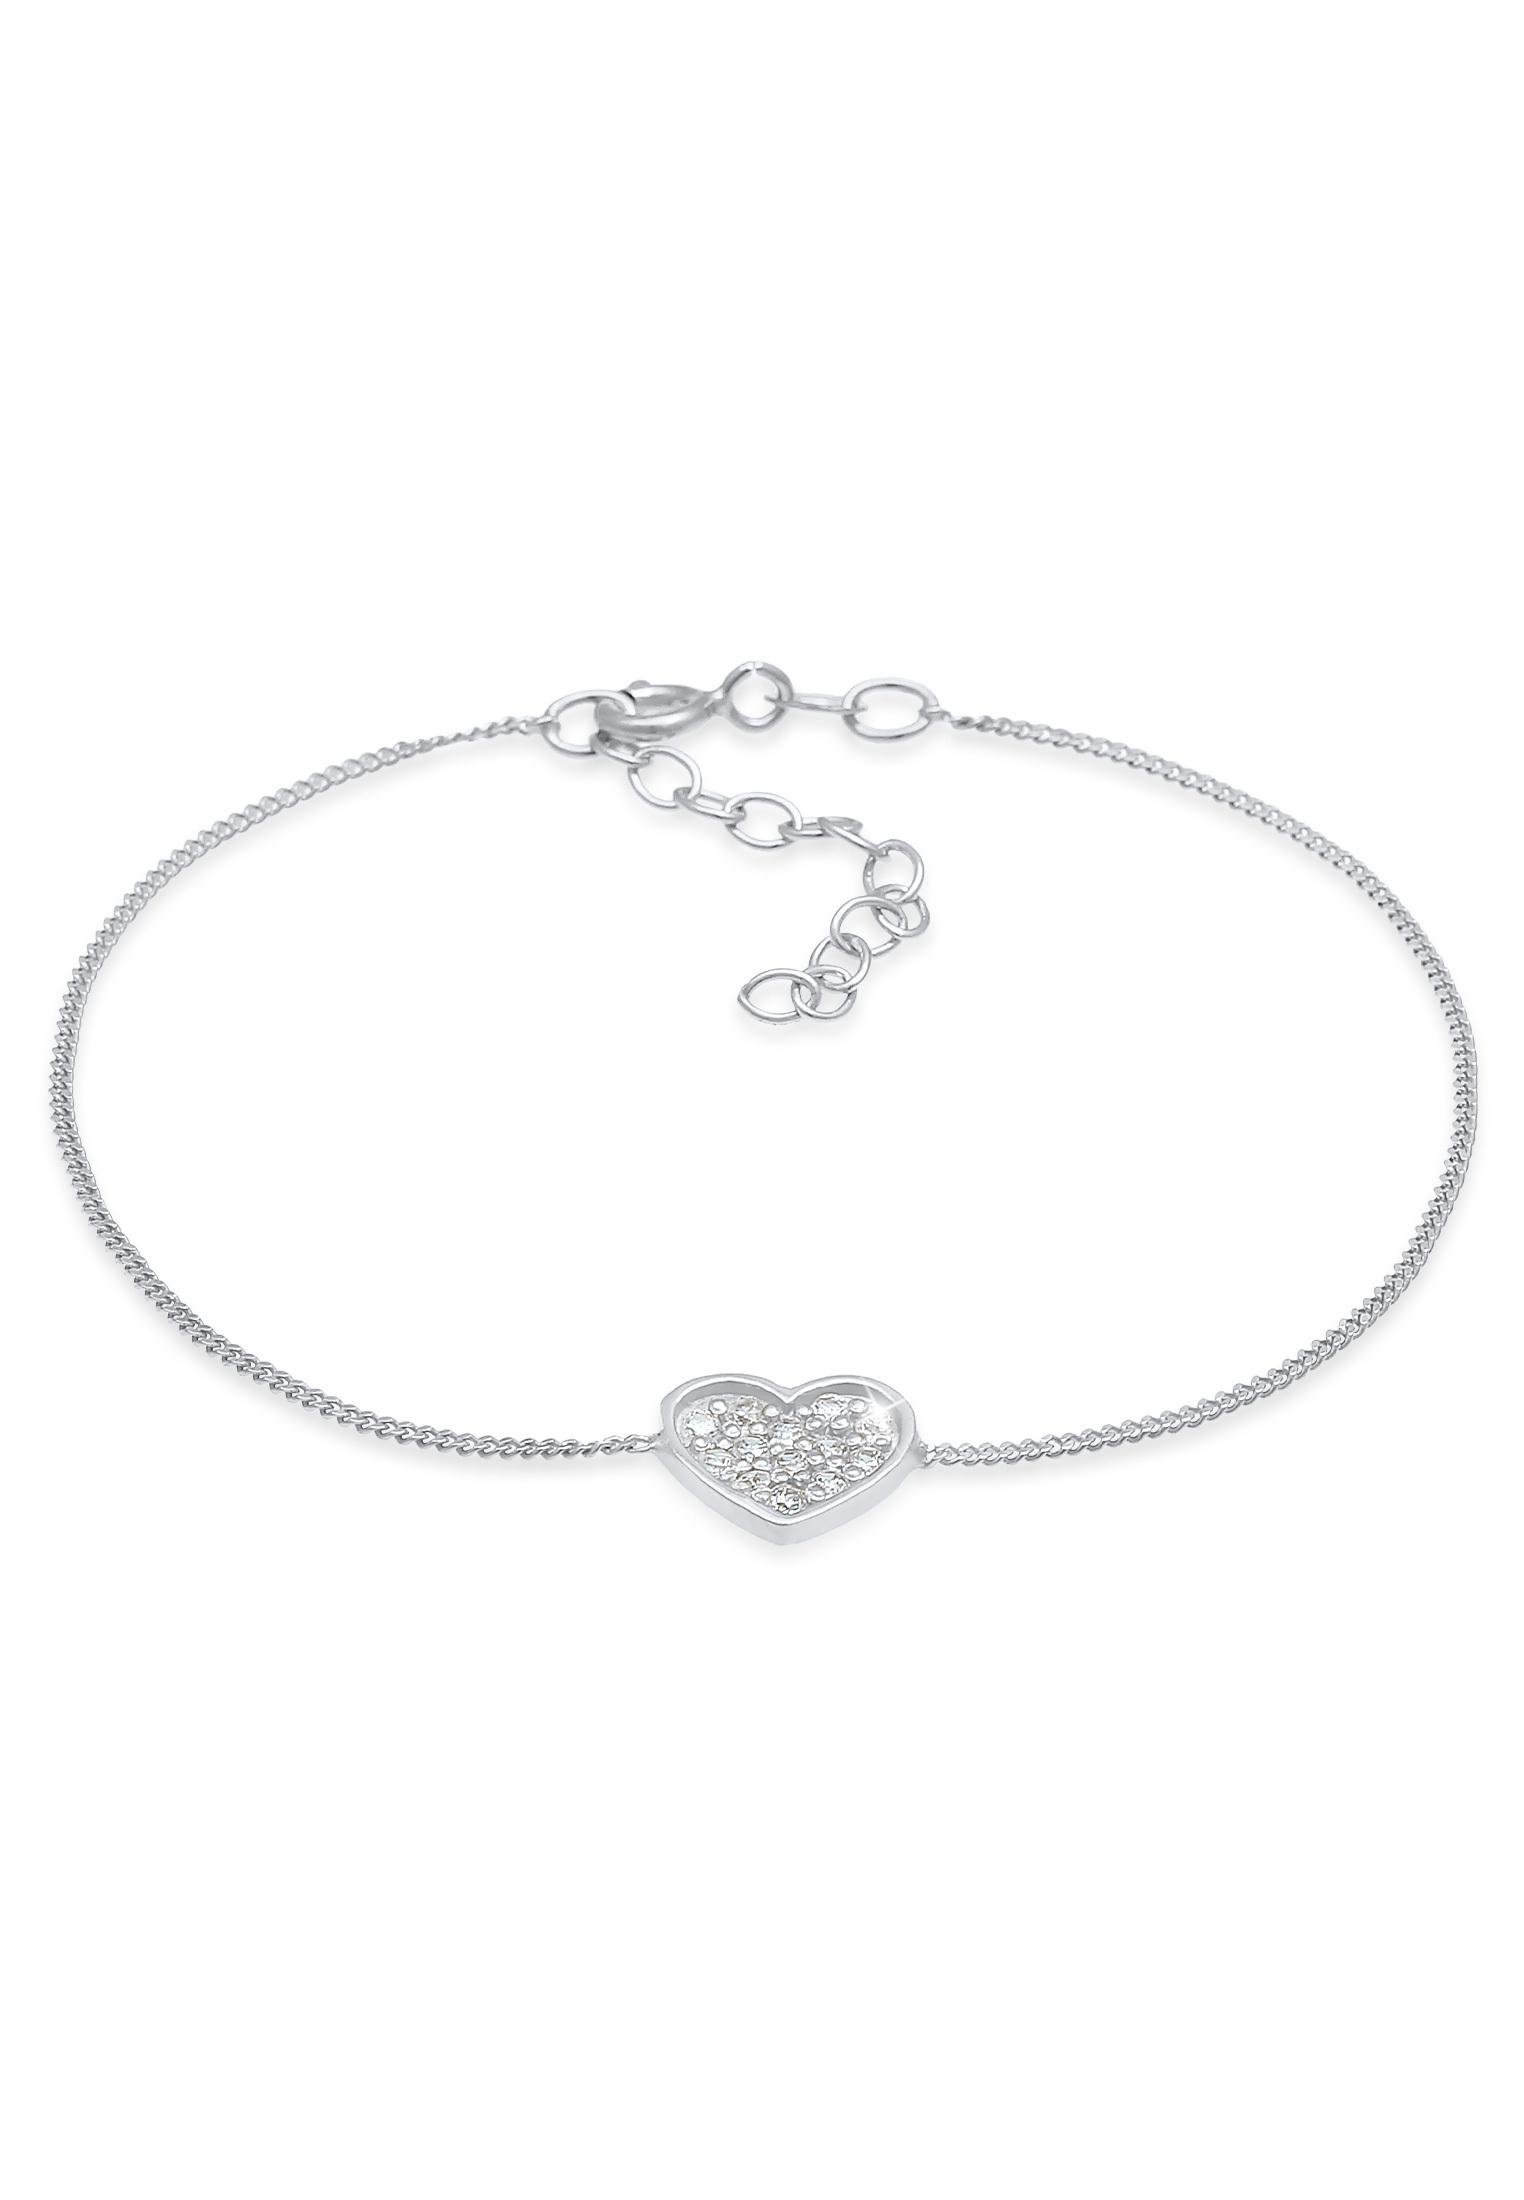 Armband Herz | Zirkonia ( Weiß ) | 925er Sterling Silber